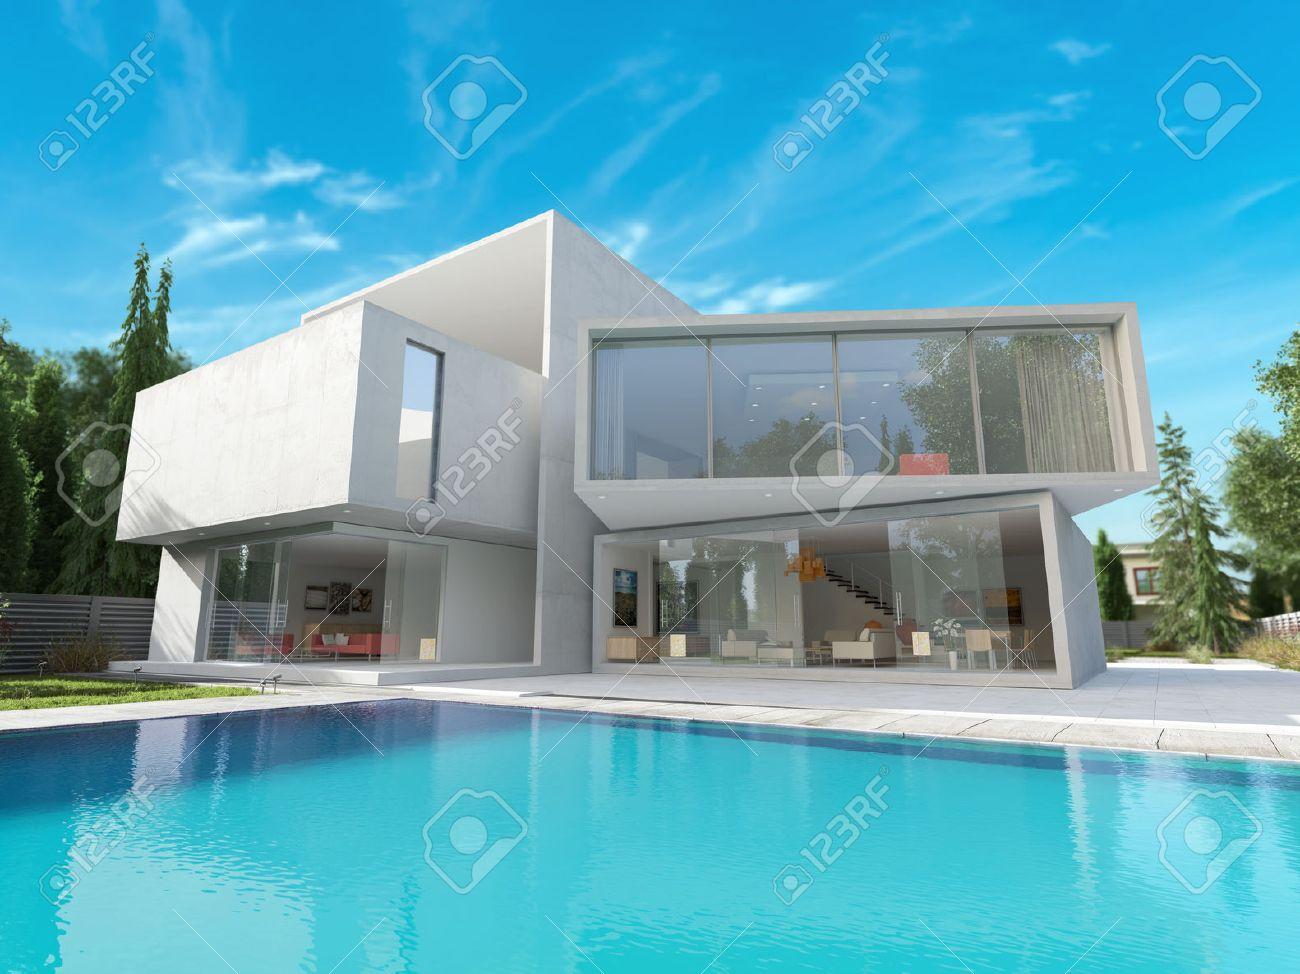 Extern syn på en modern hus med pool royalty fria stockfoton ...